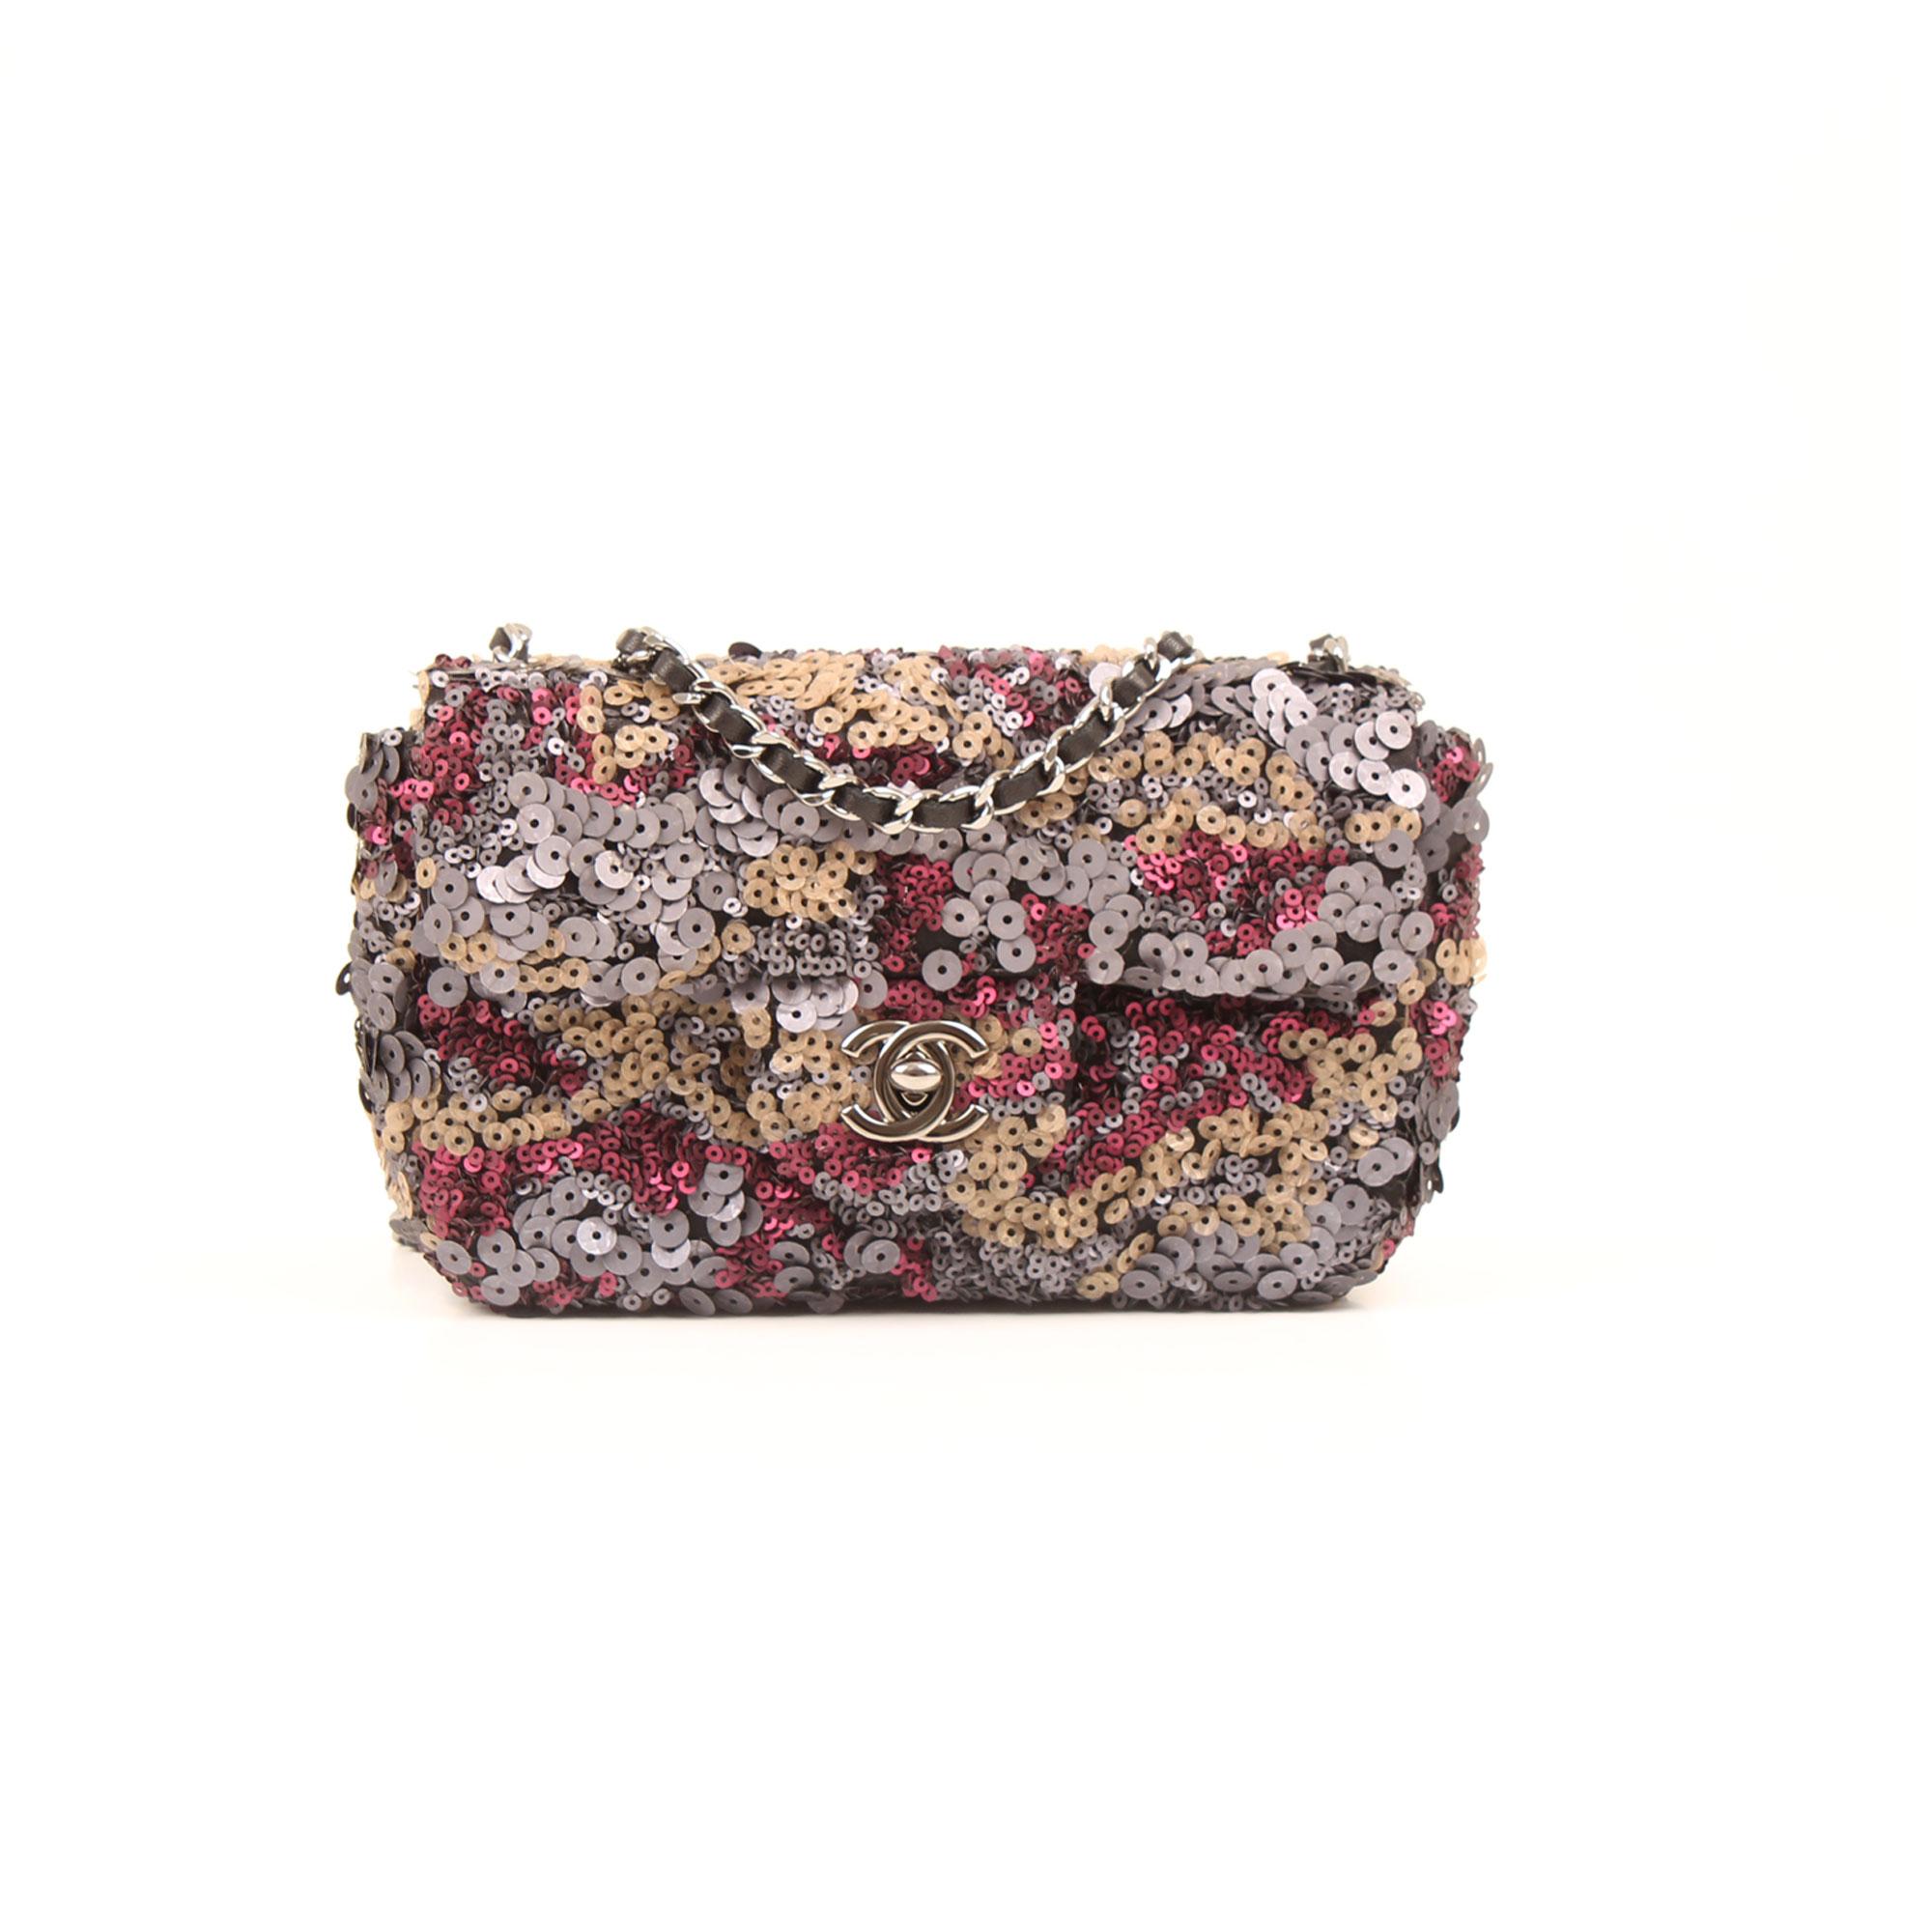 997ab5c32357 Imagen del dustbag del bolso chanel mini classic flap lentejuelas multicolor